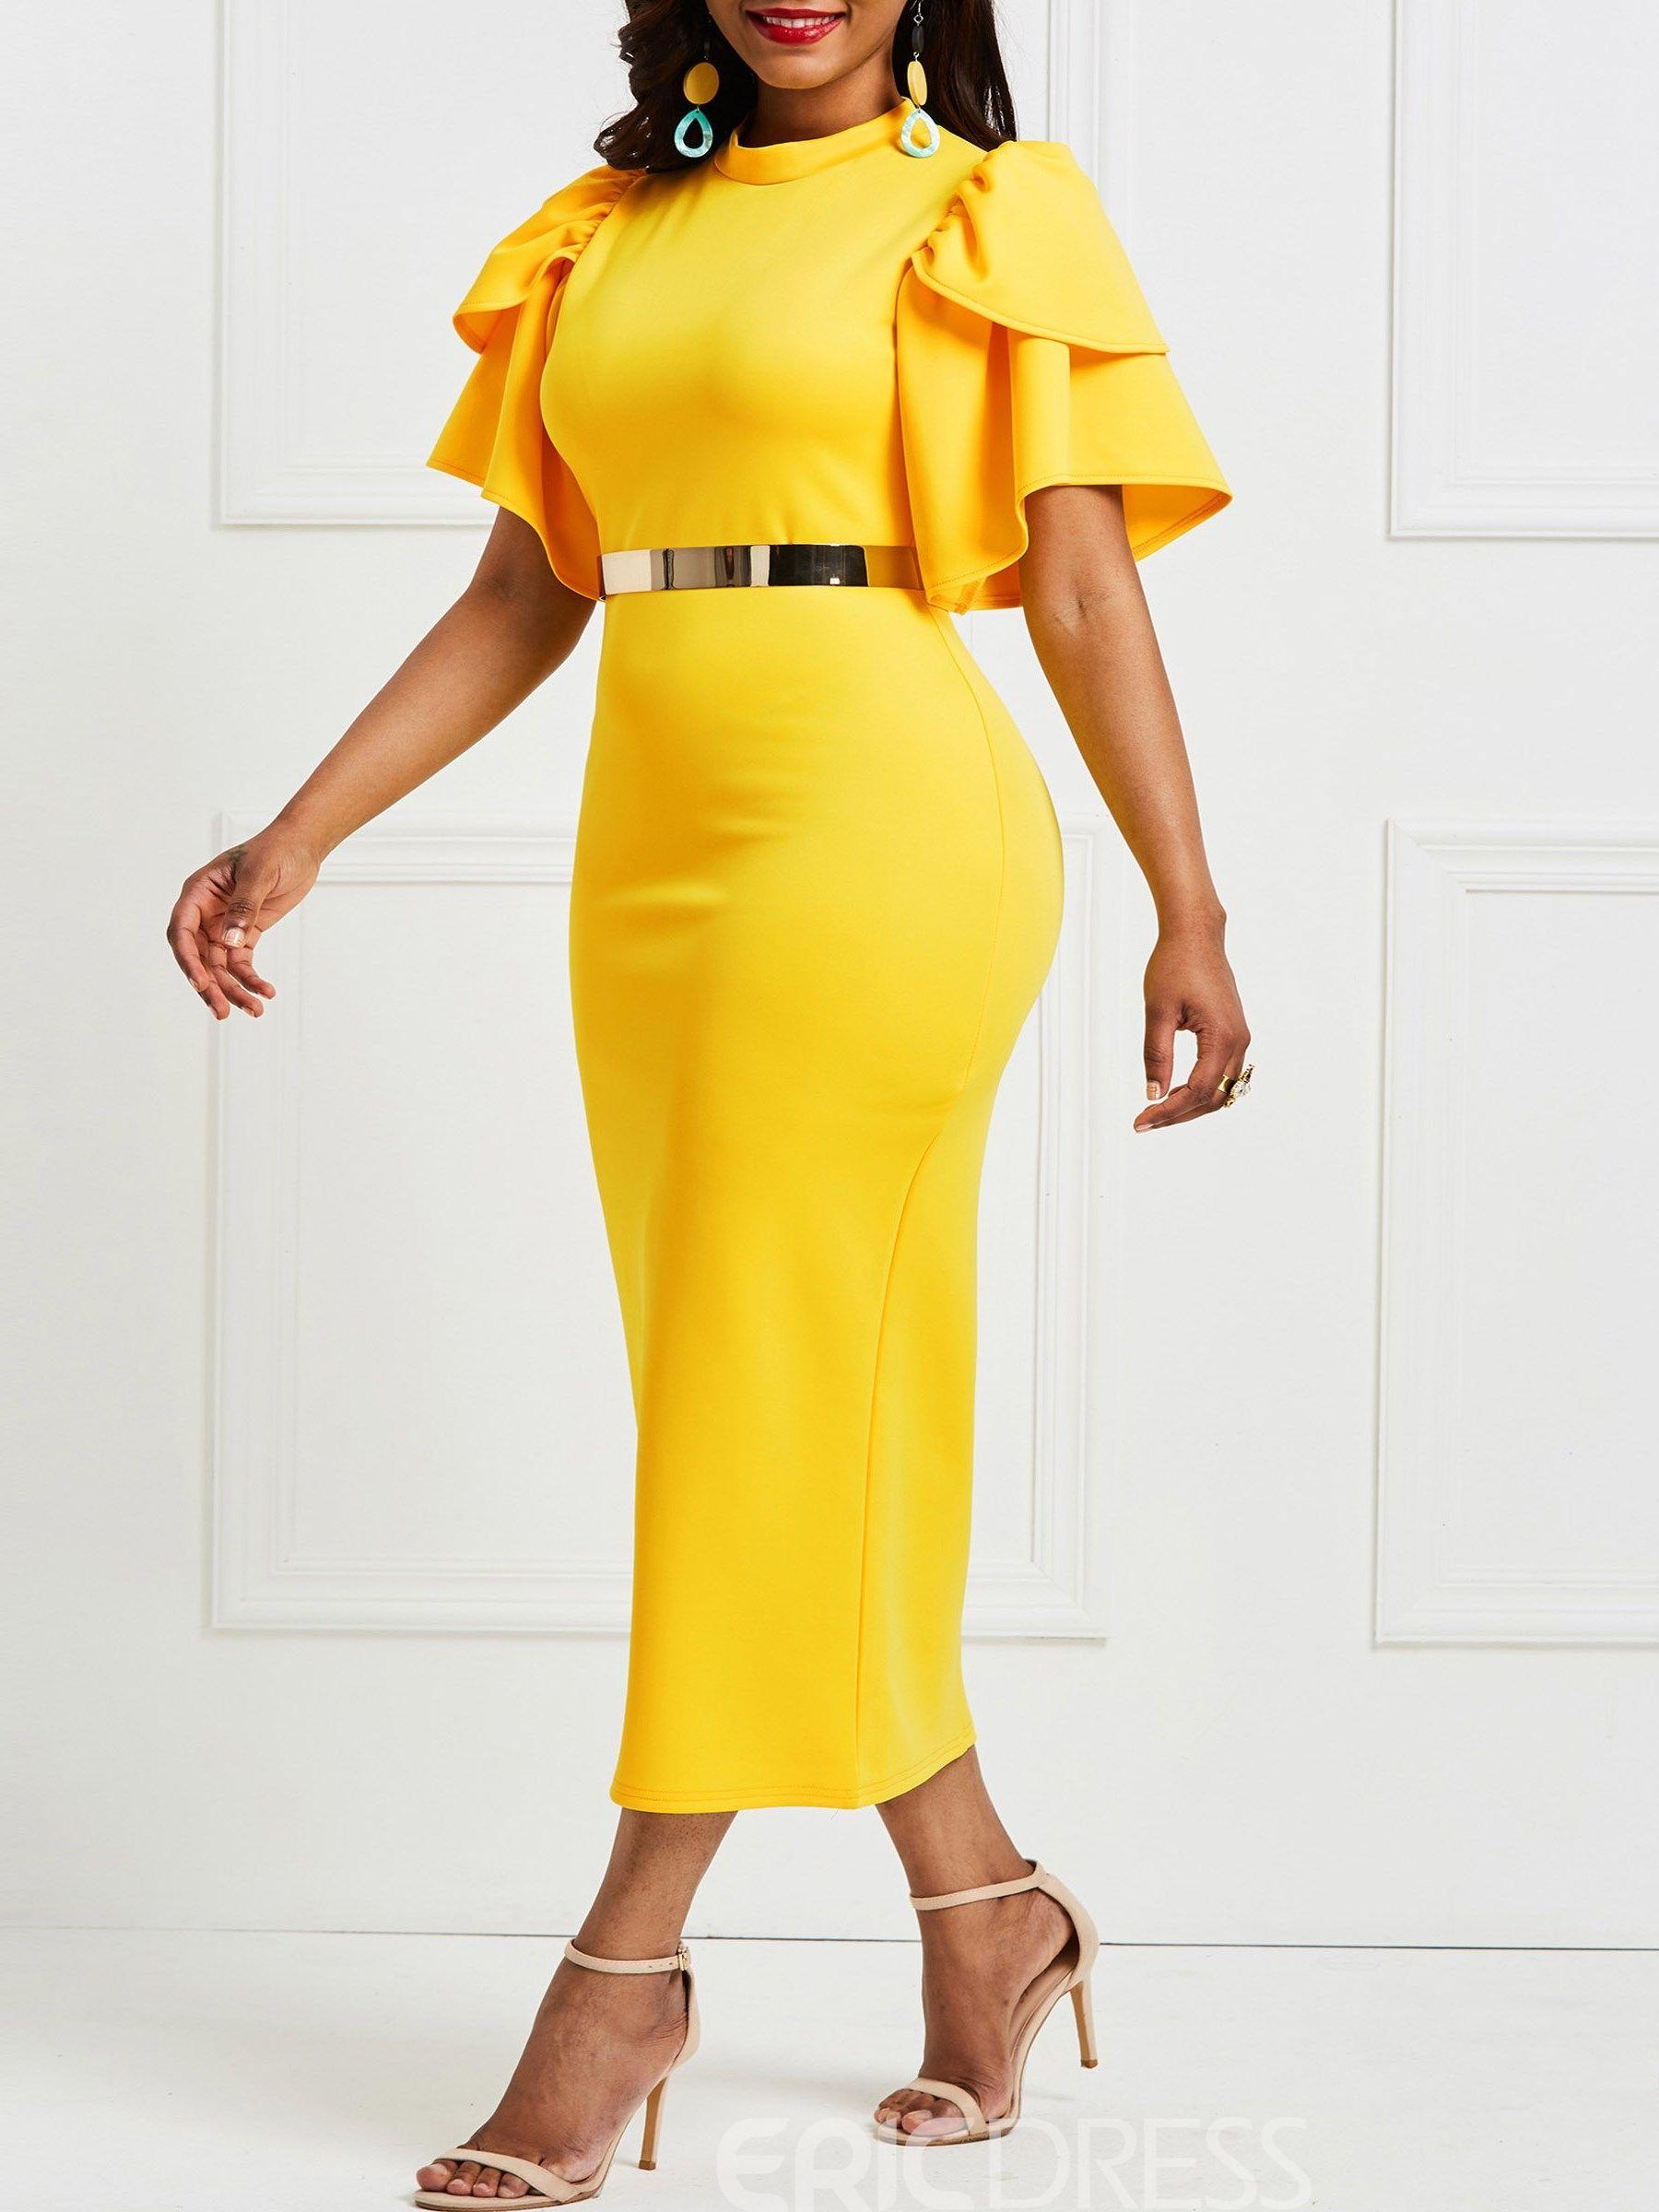 20++ Yellow dress for women information